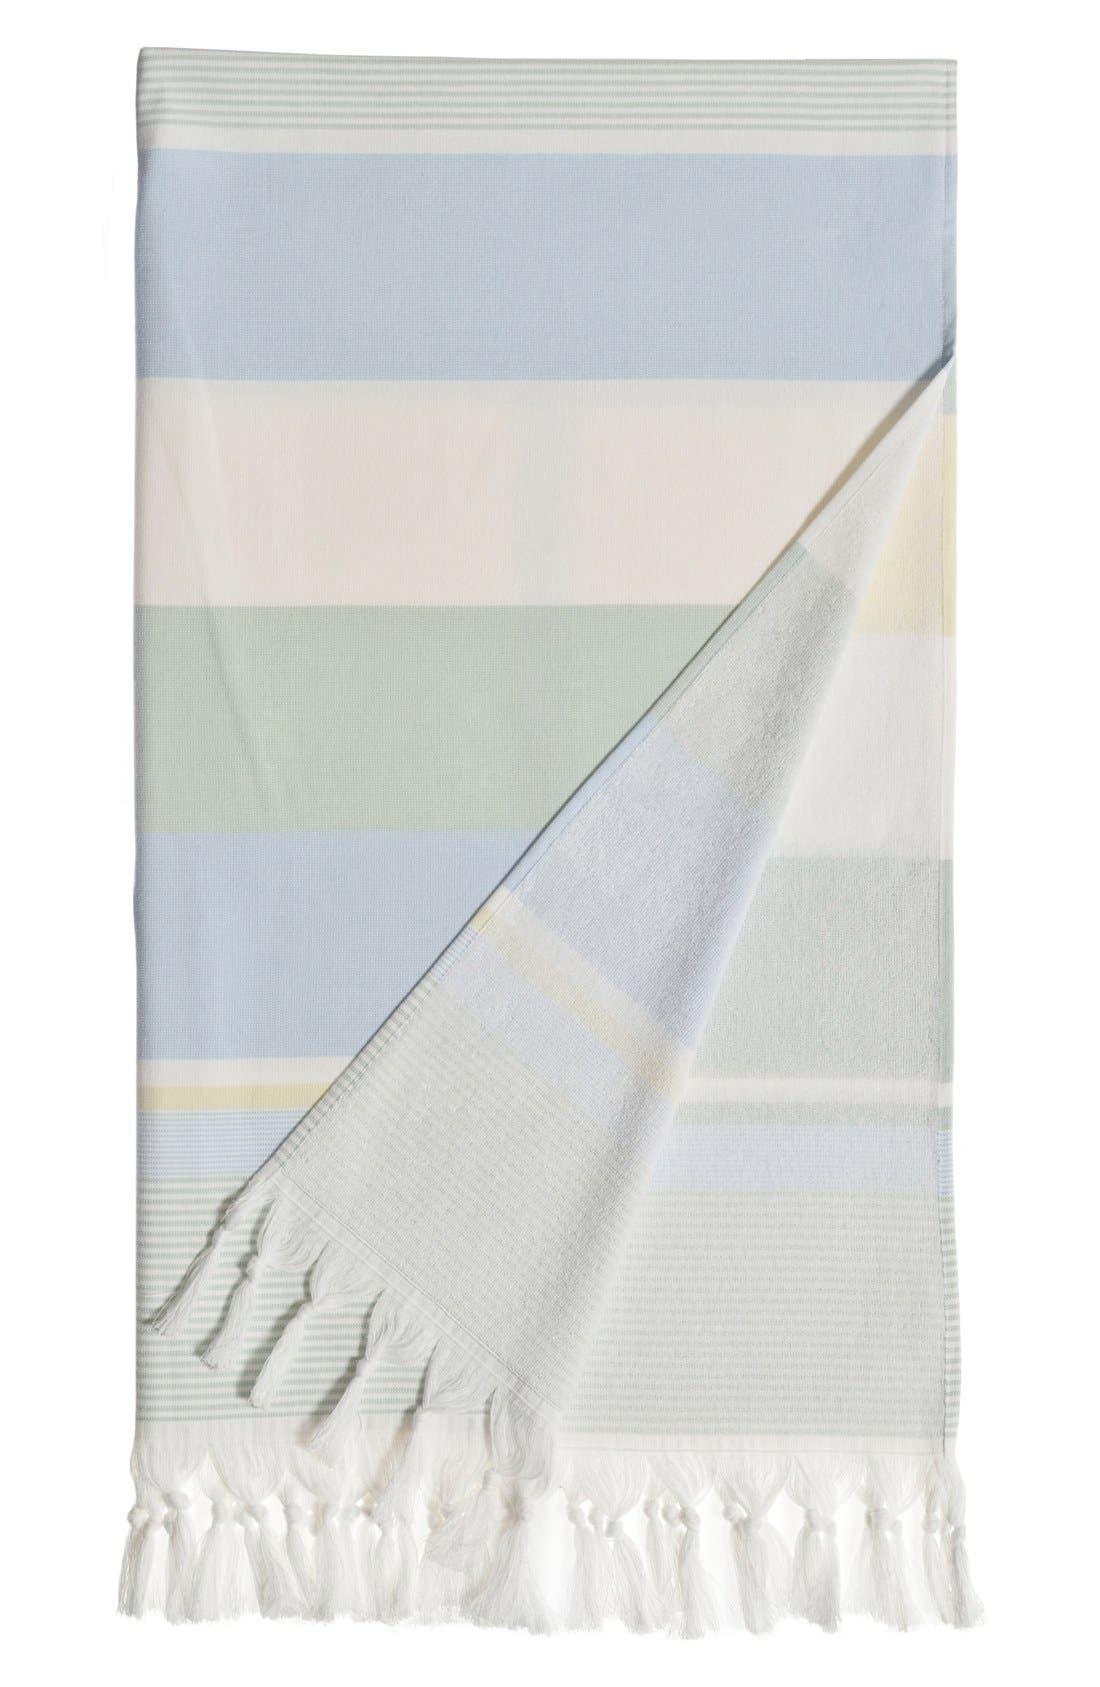 'Summer Loving' Turkish Pestemal Towel,                         Main,                         color, Sky Blue